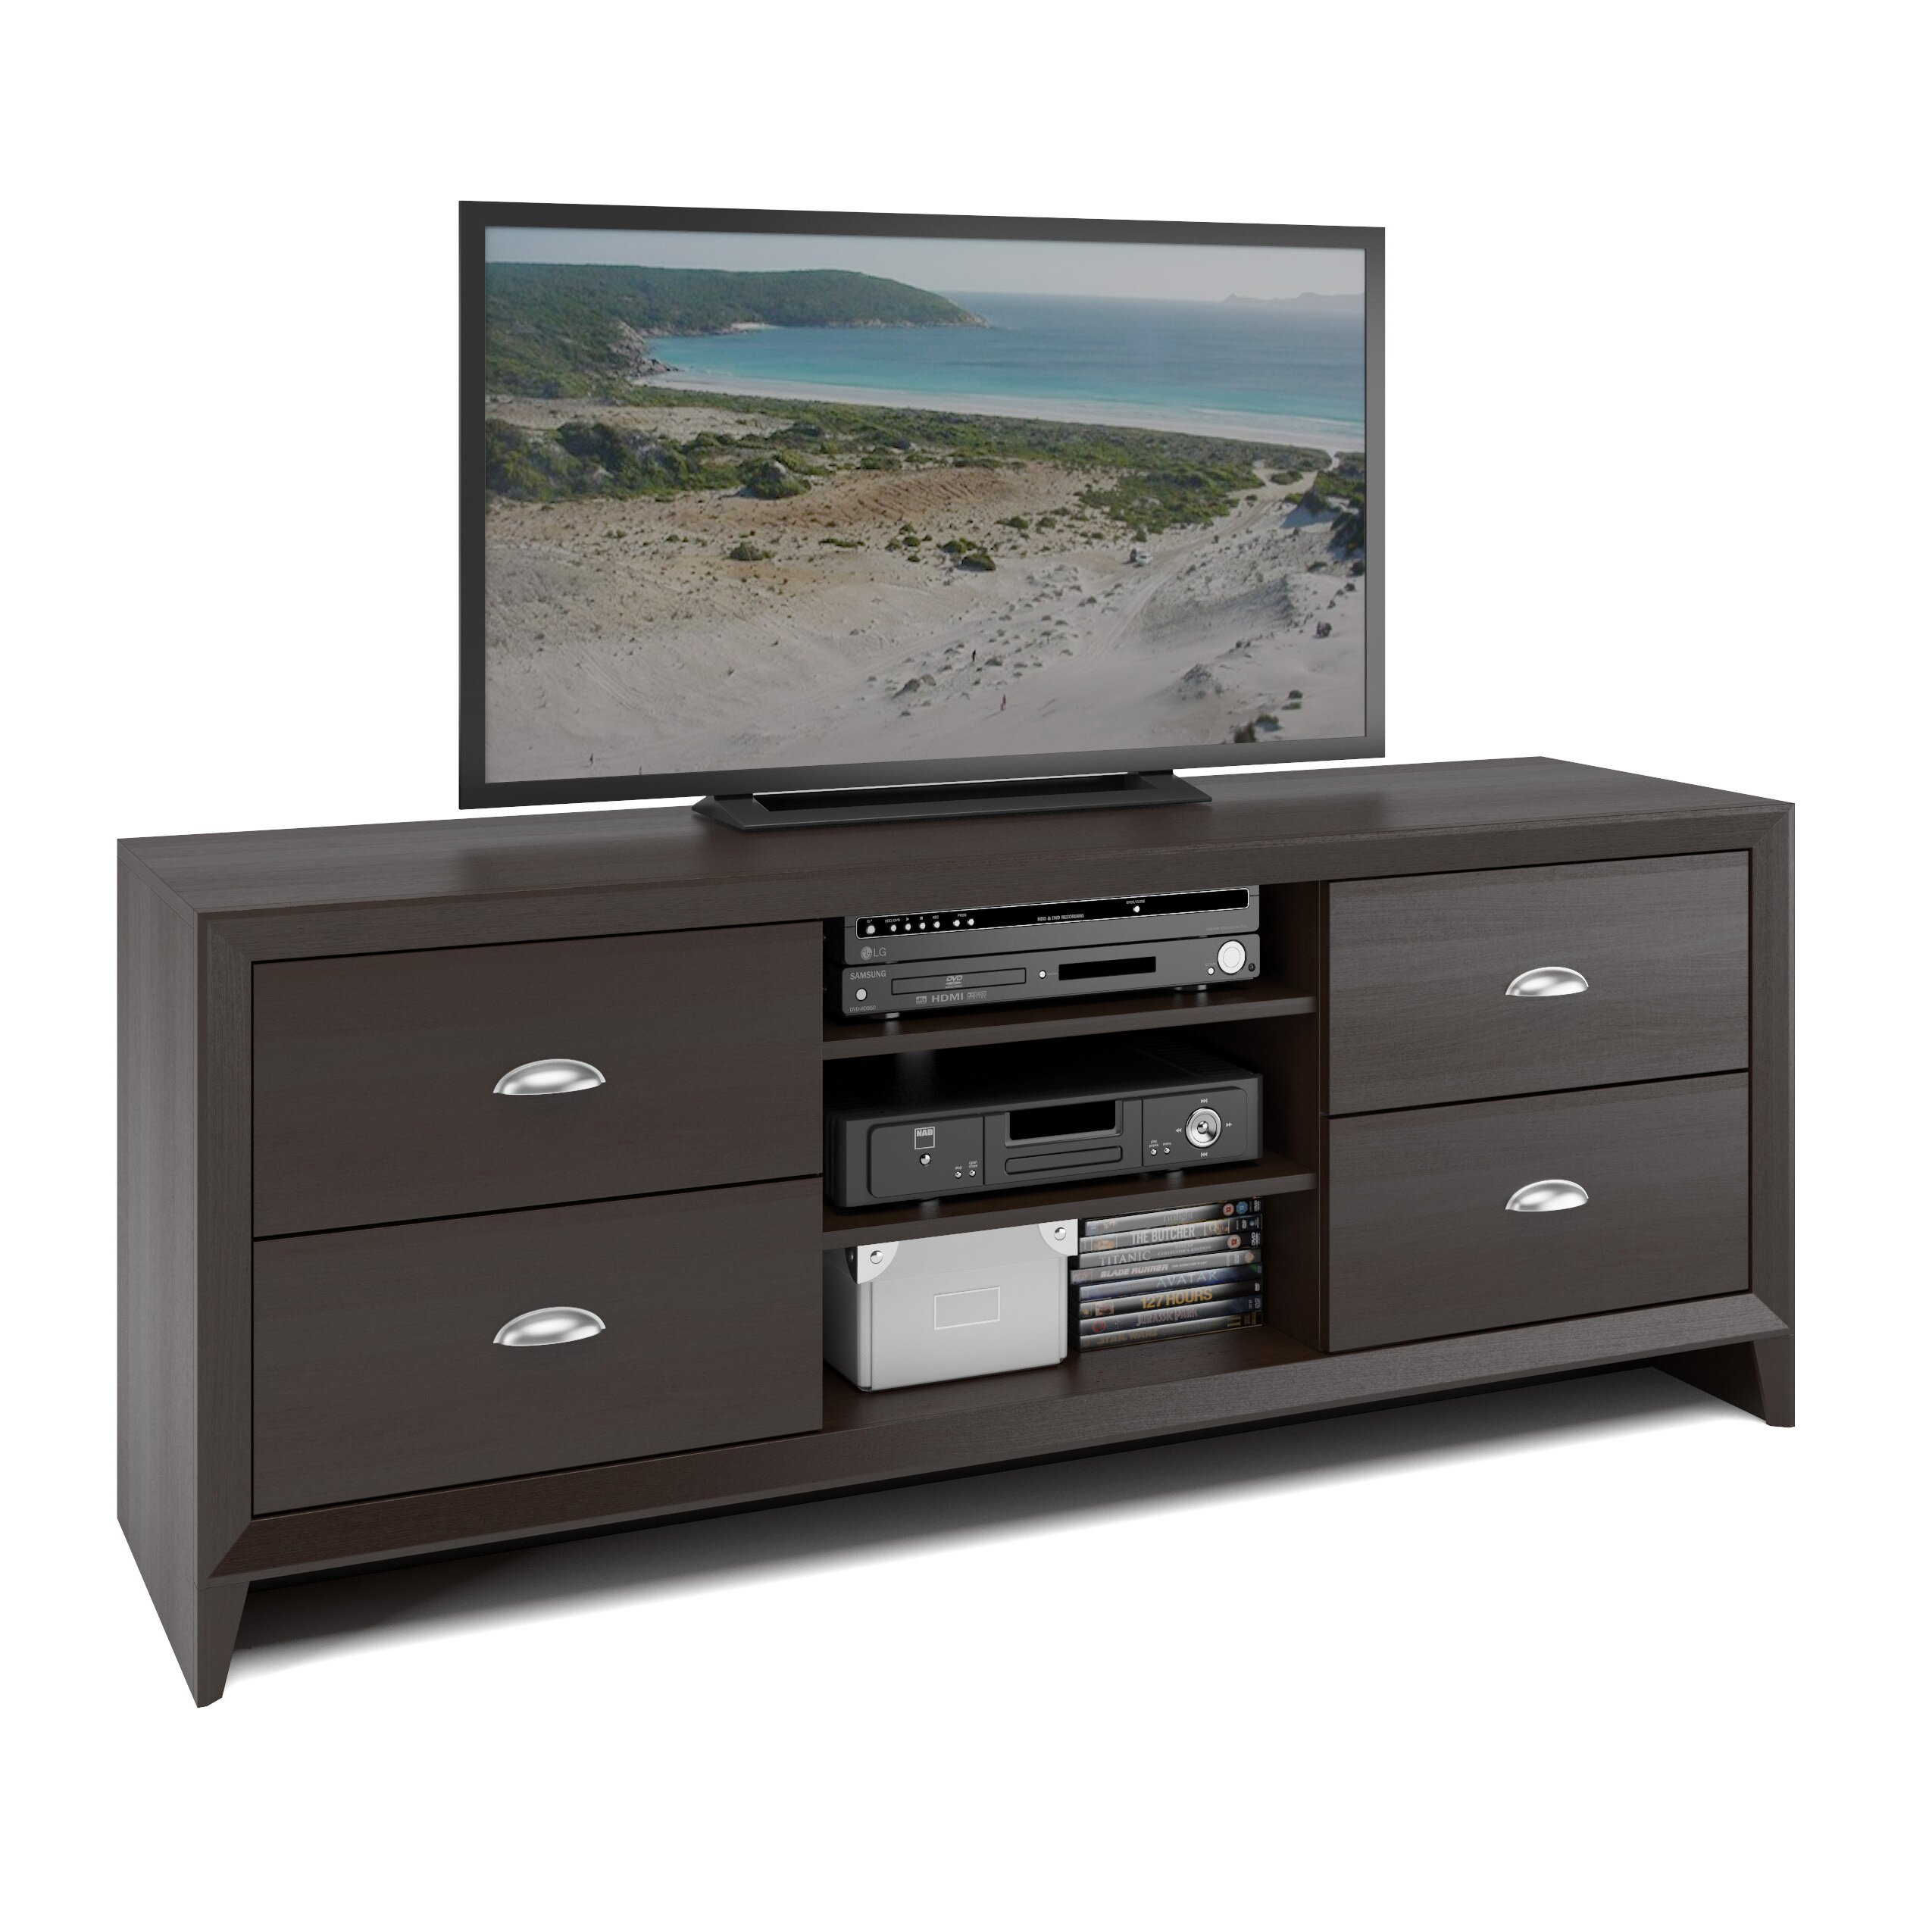 dcor design furniture website  dcor design tv stand american hwy. dcor design furniture website   images  dcor design furniture